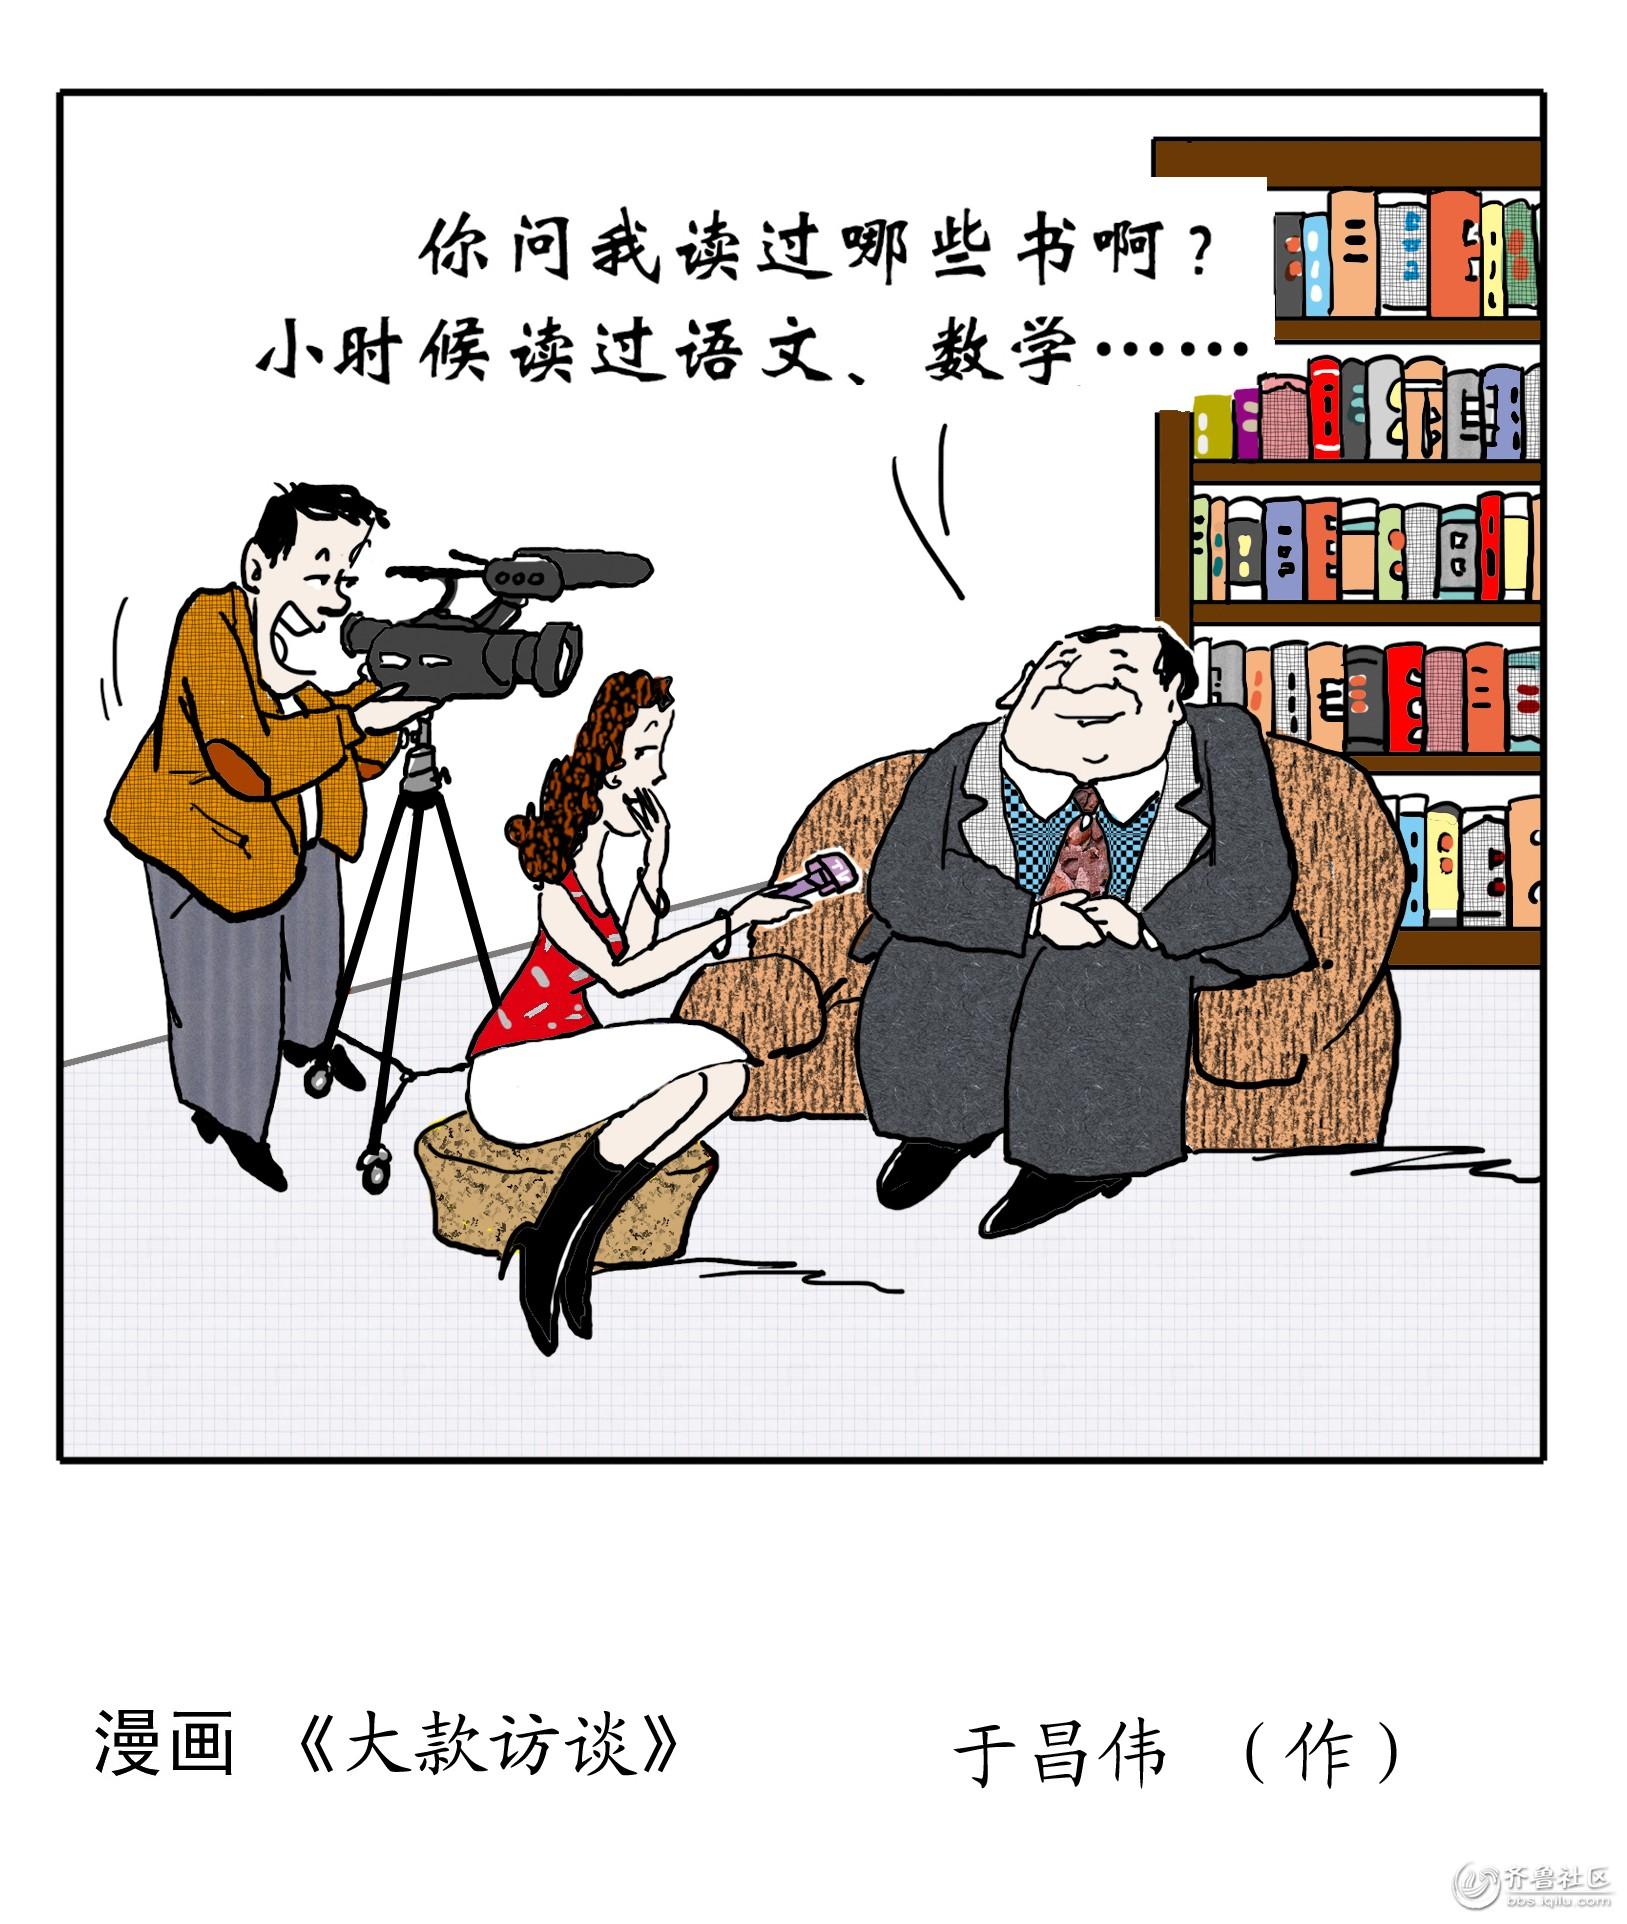 wb1彩色漫画《大款访谈》.jpg